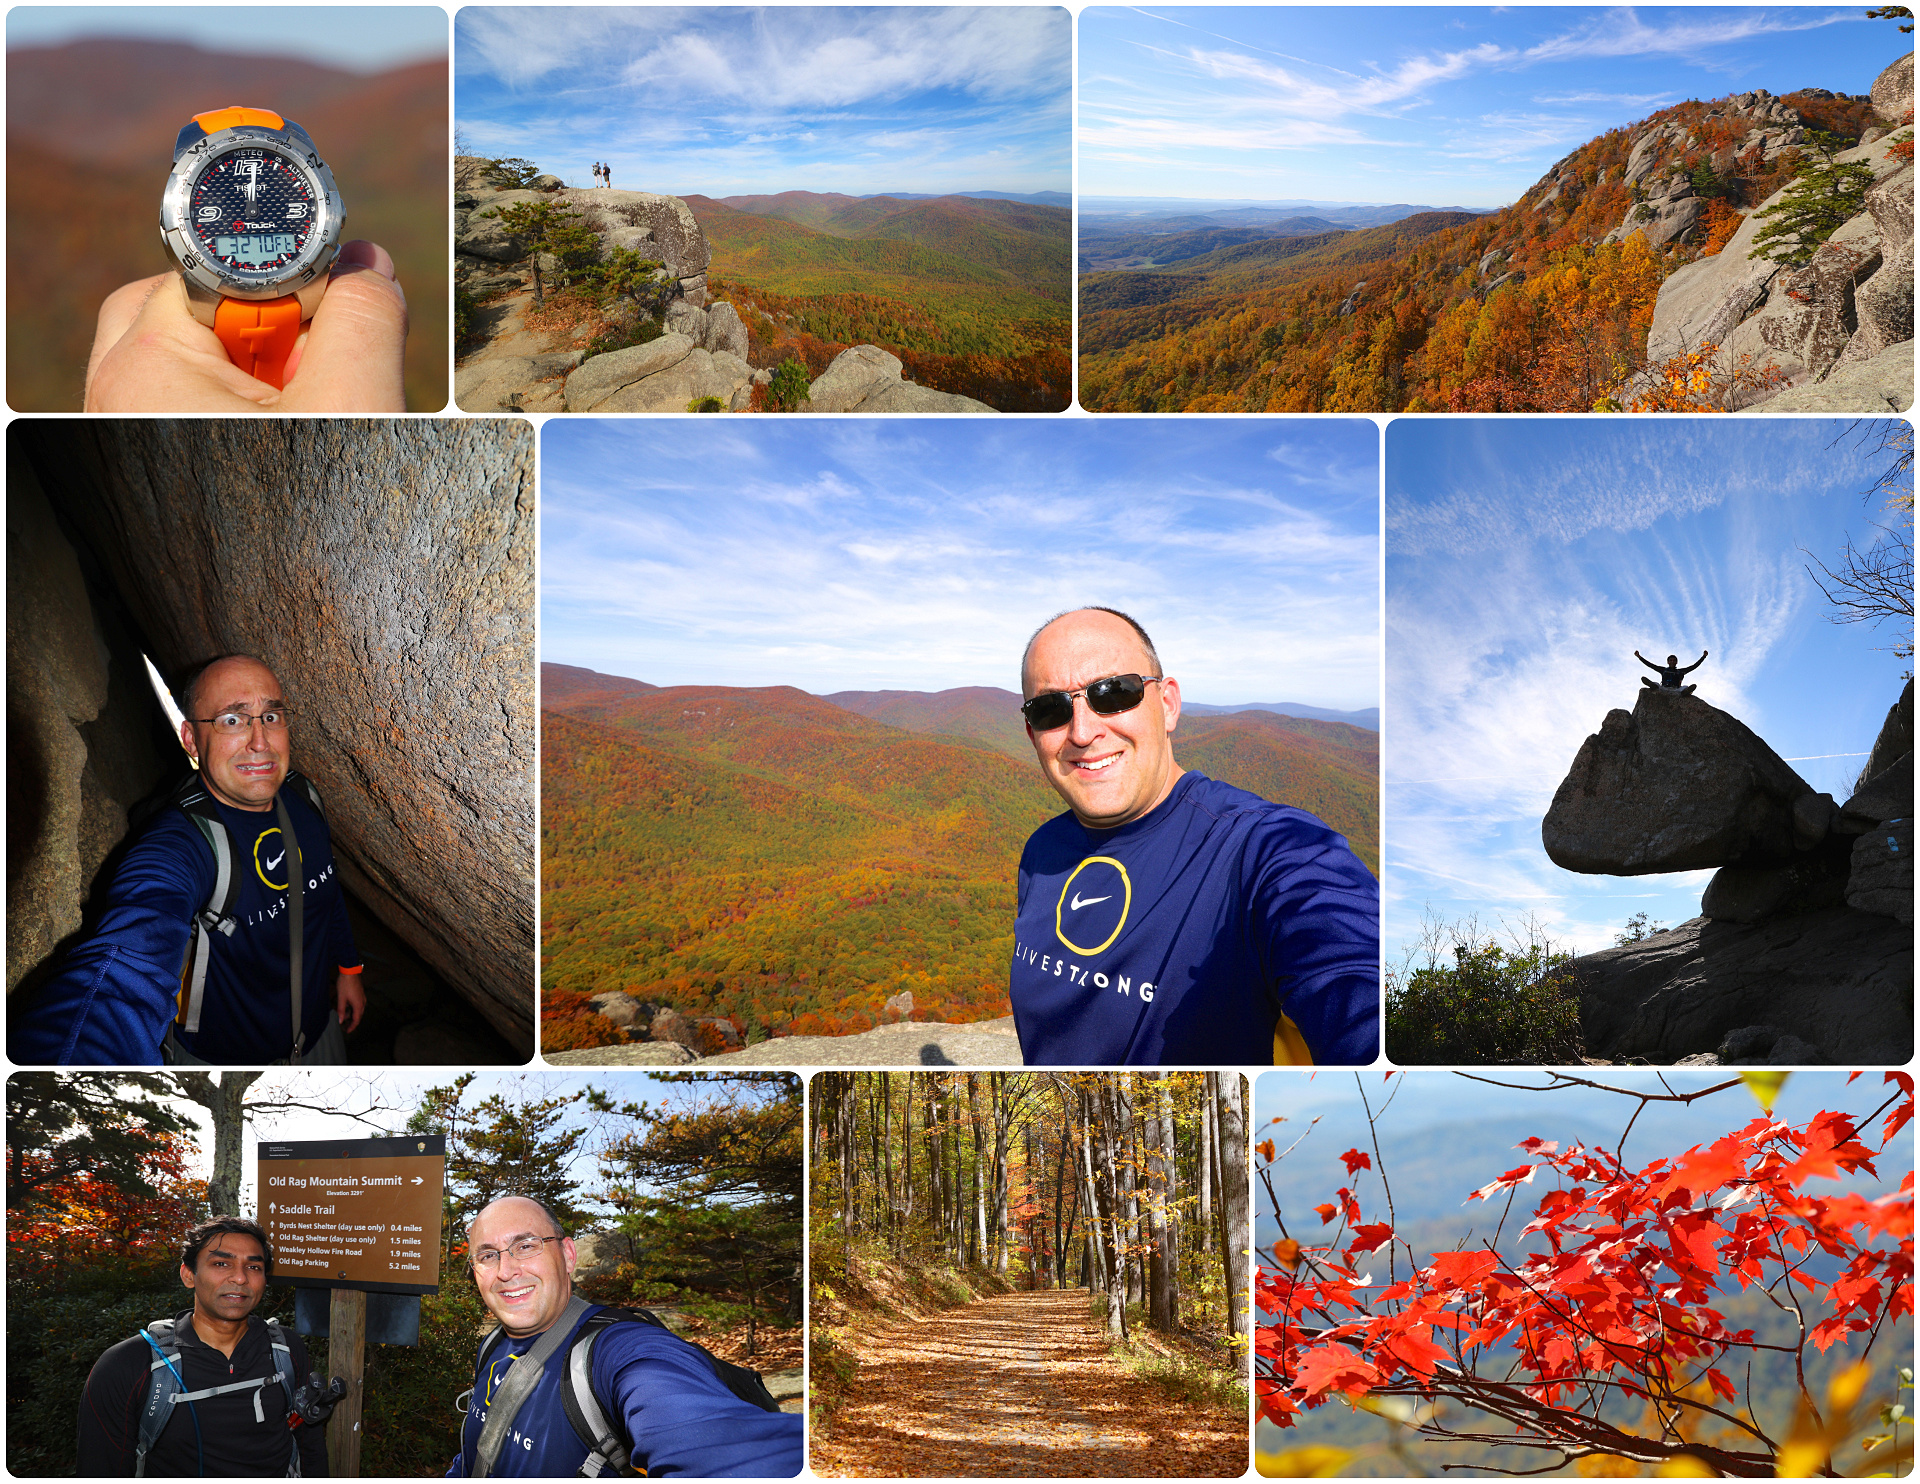 Hiking Old Rag Mountain, October 22nd, 2015